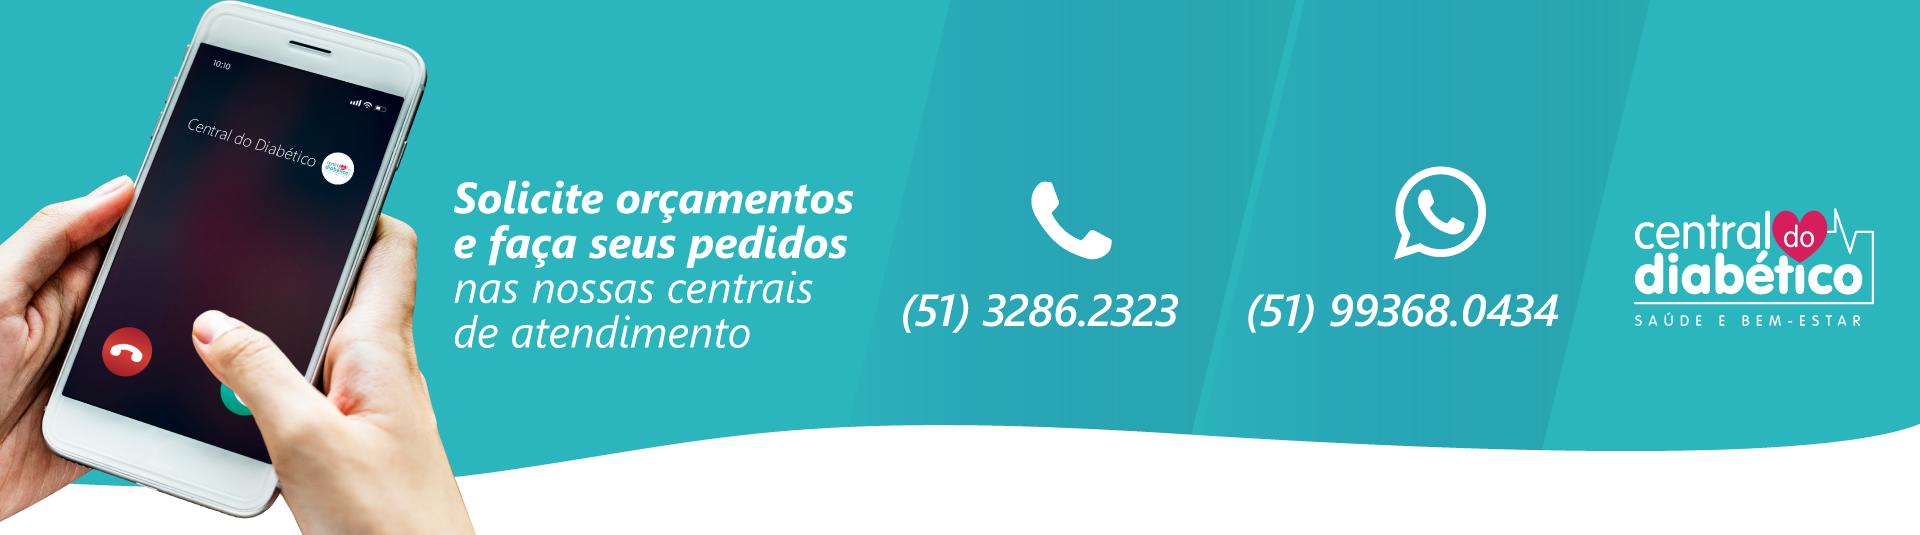 Banner Telefone e Whats